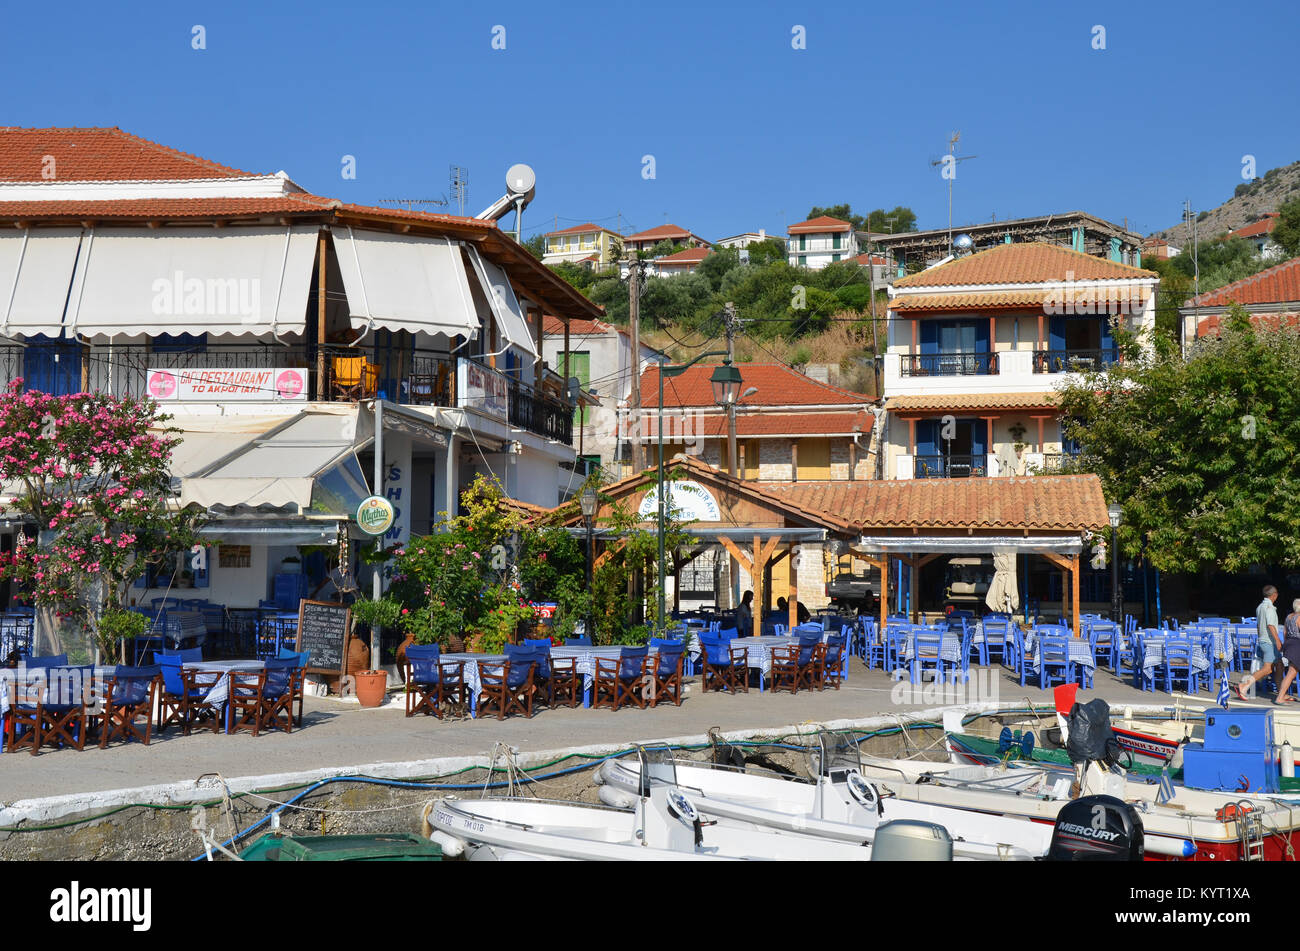 An Ionian Sailing Holiday - Stock Image